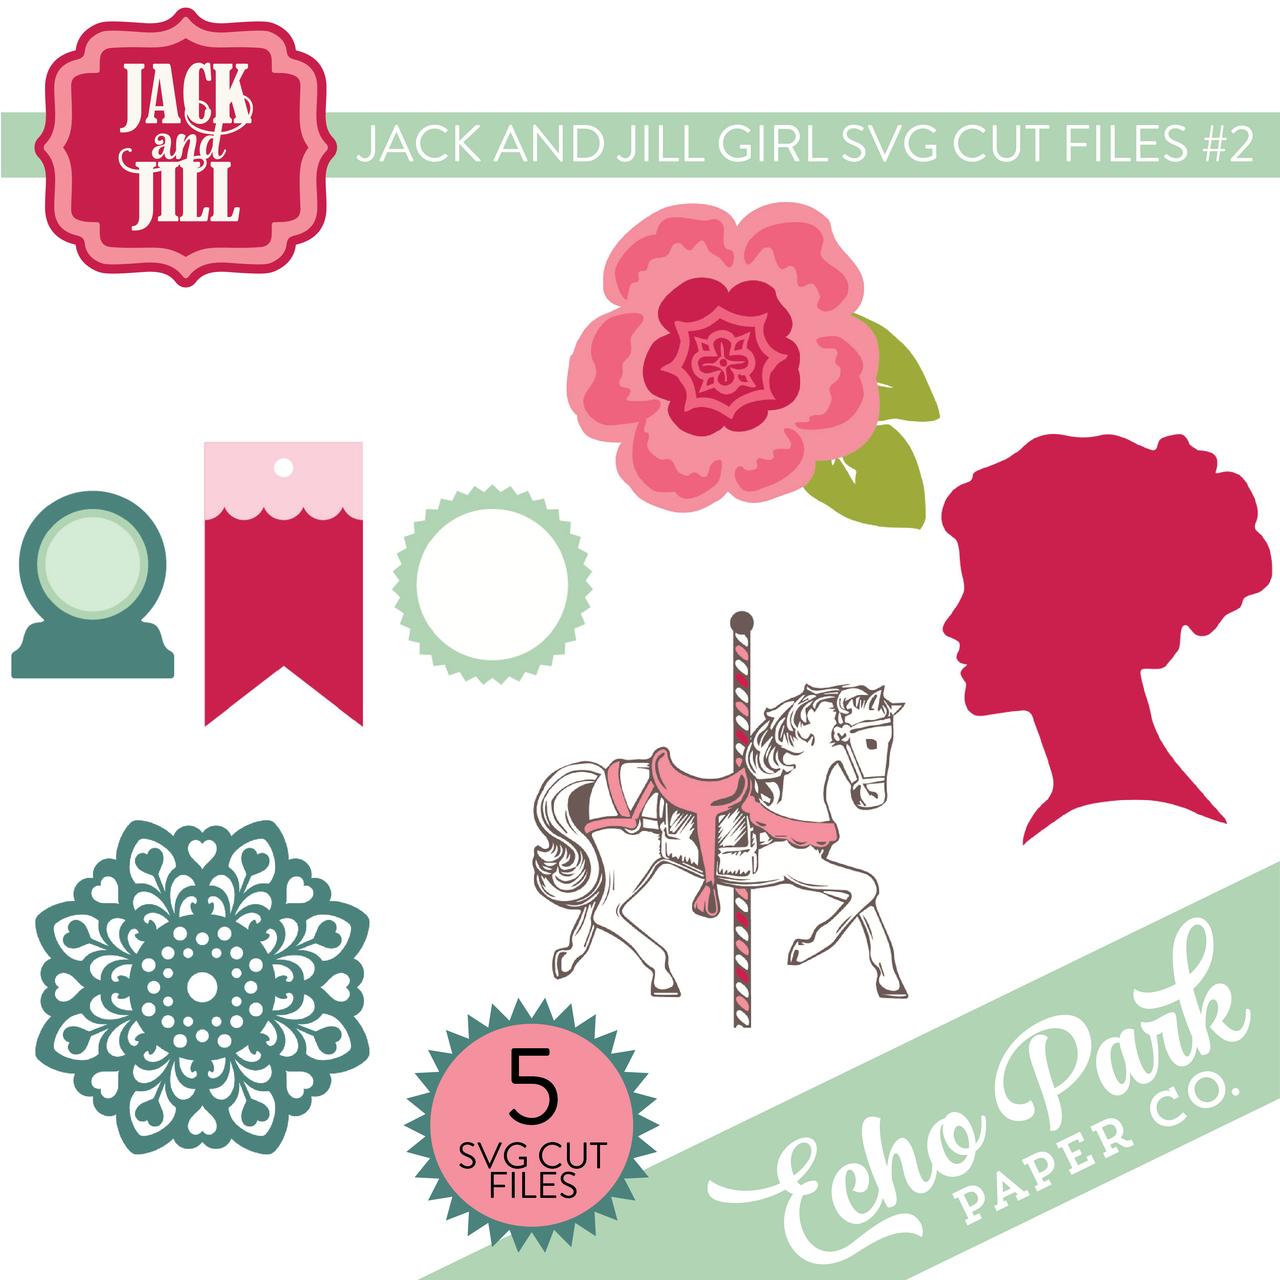 Jack and Jill - Girl SVG Cut Files #2